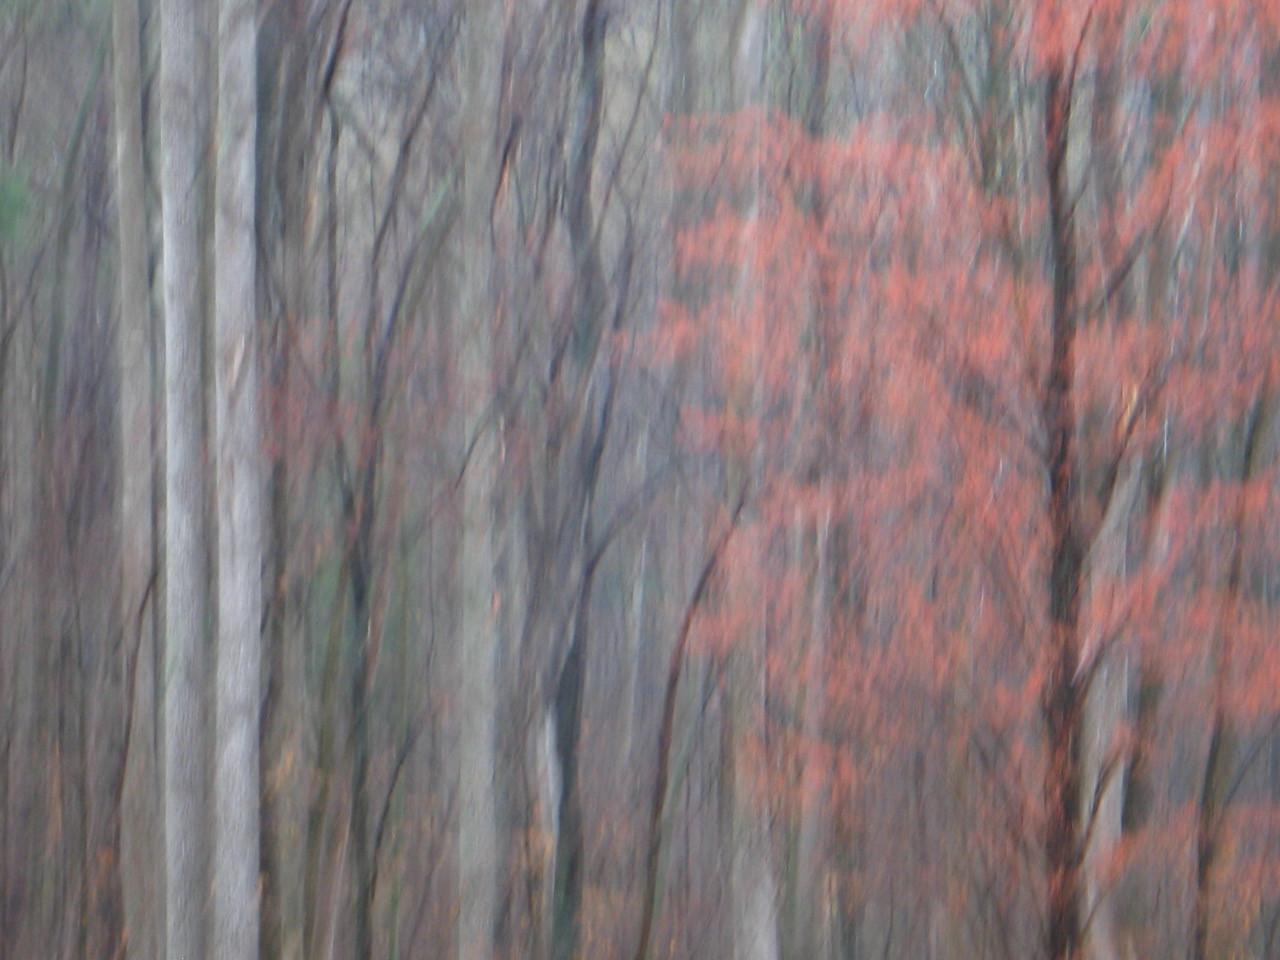 Trees 7 Virginia